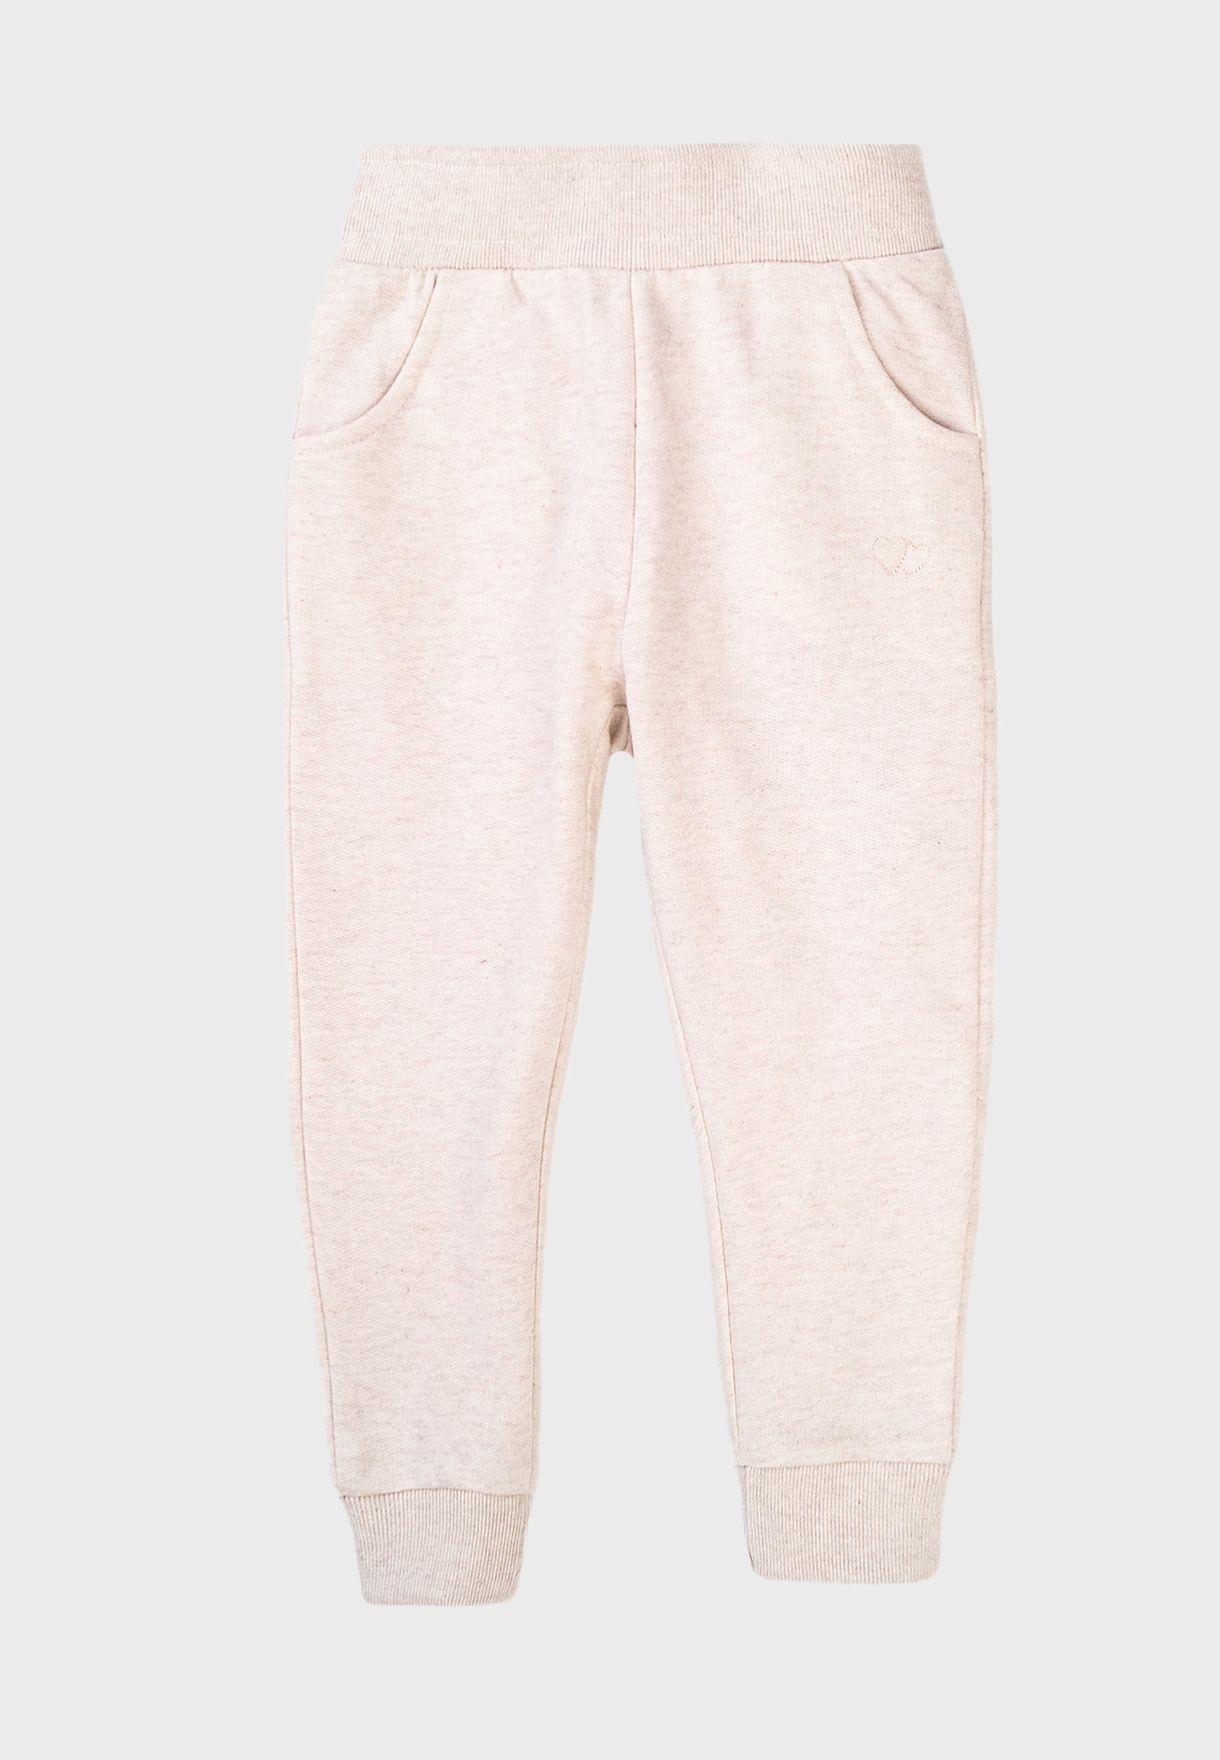 Kids Basic Embroidered Sweatpants